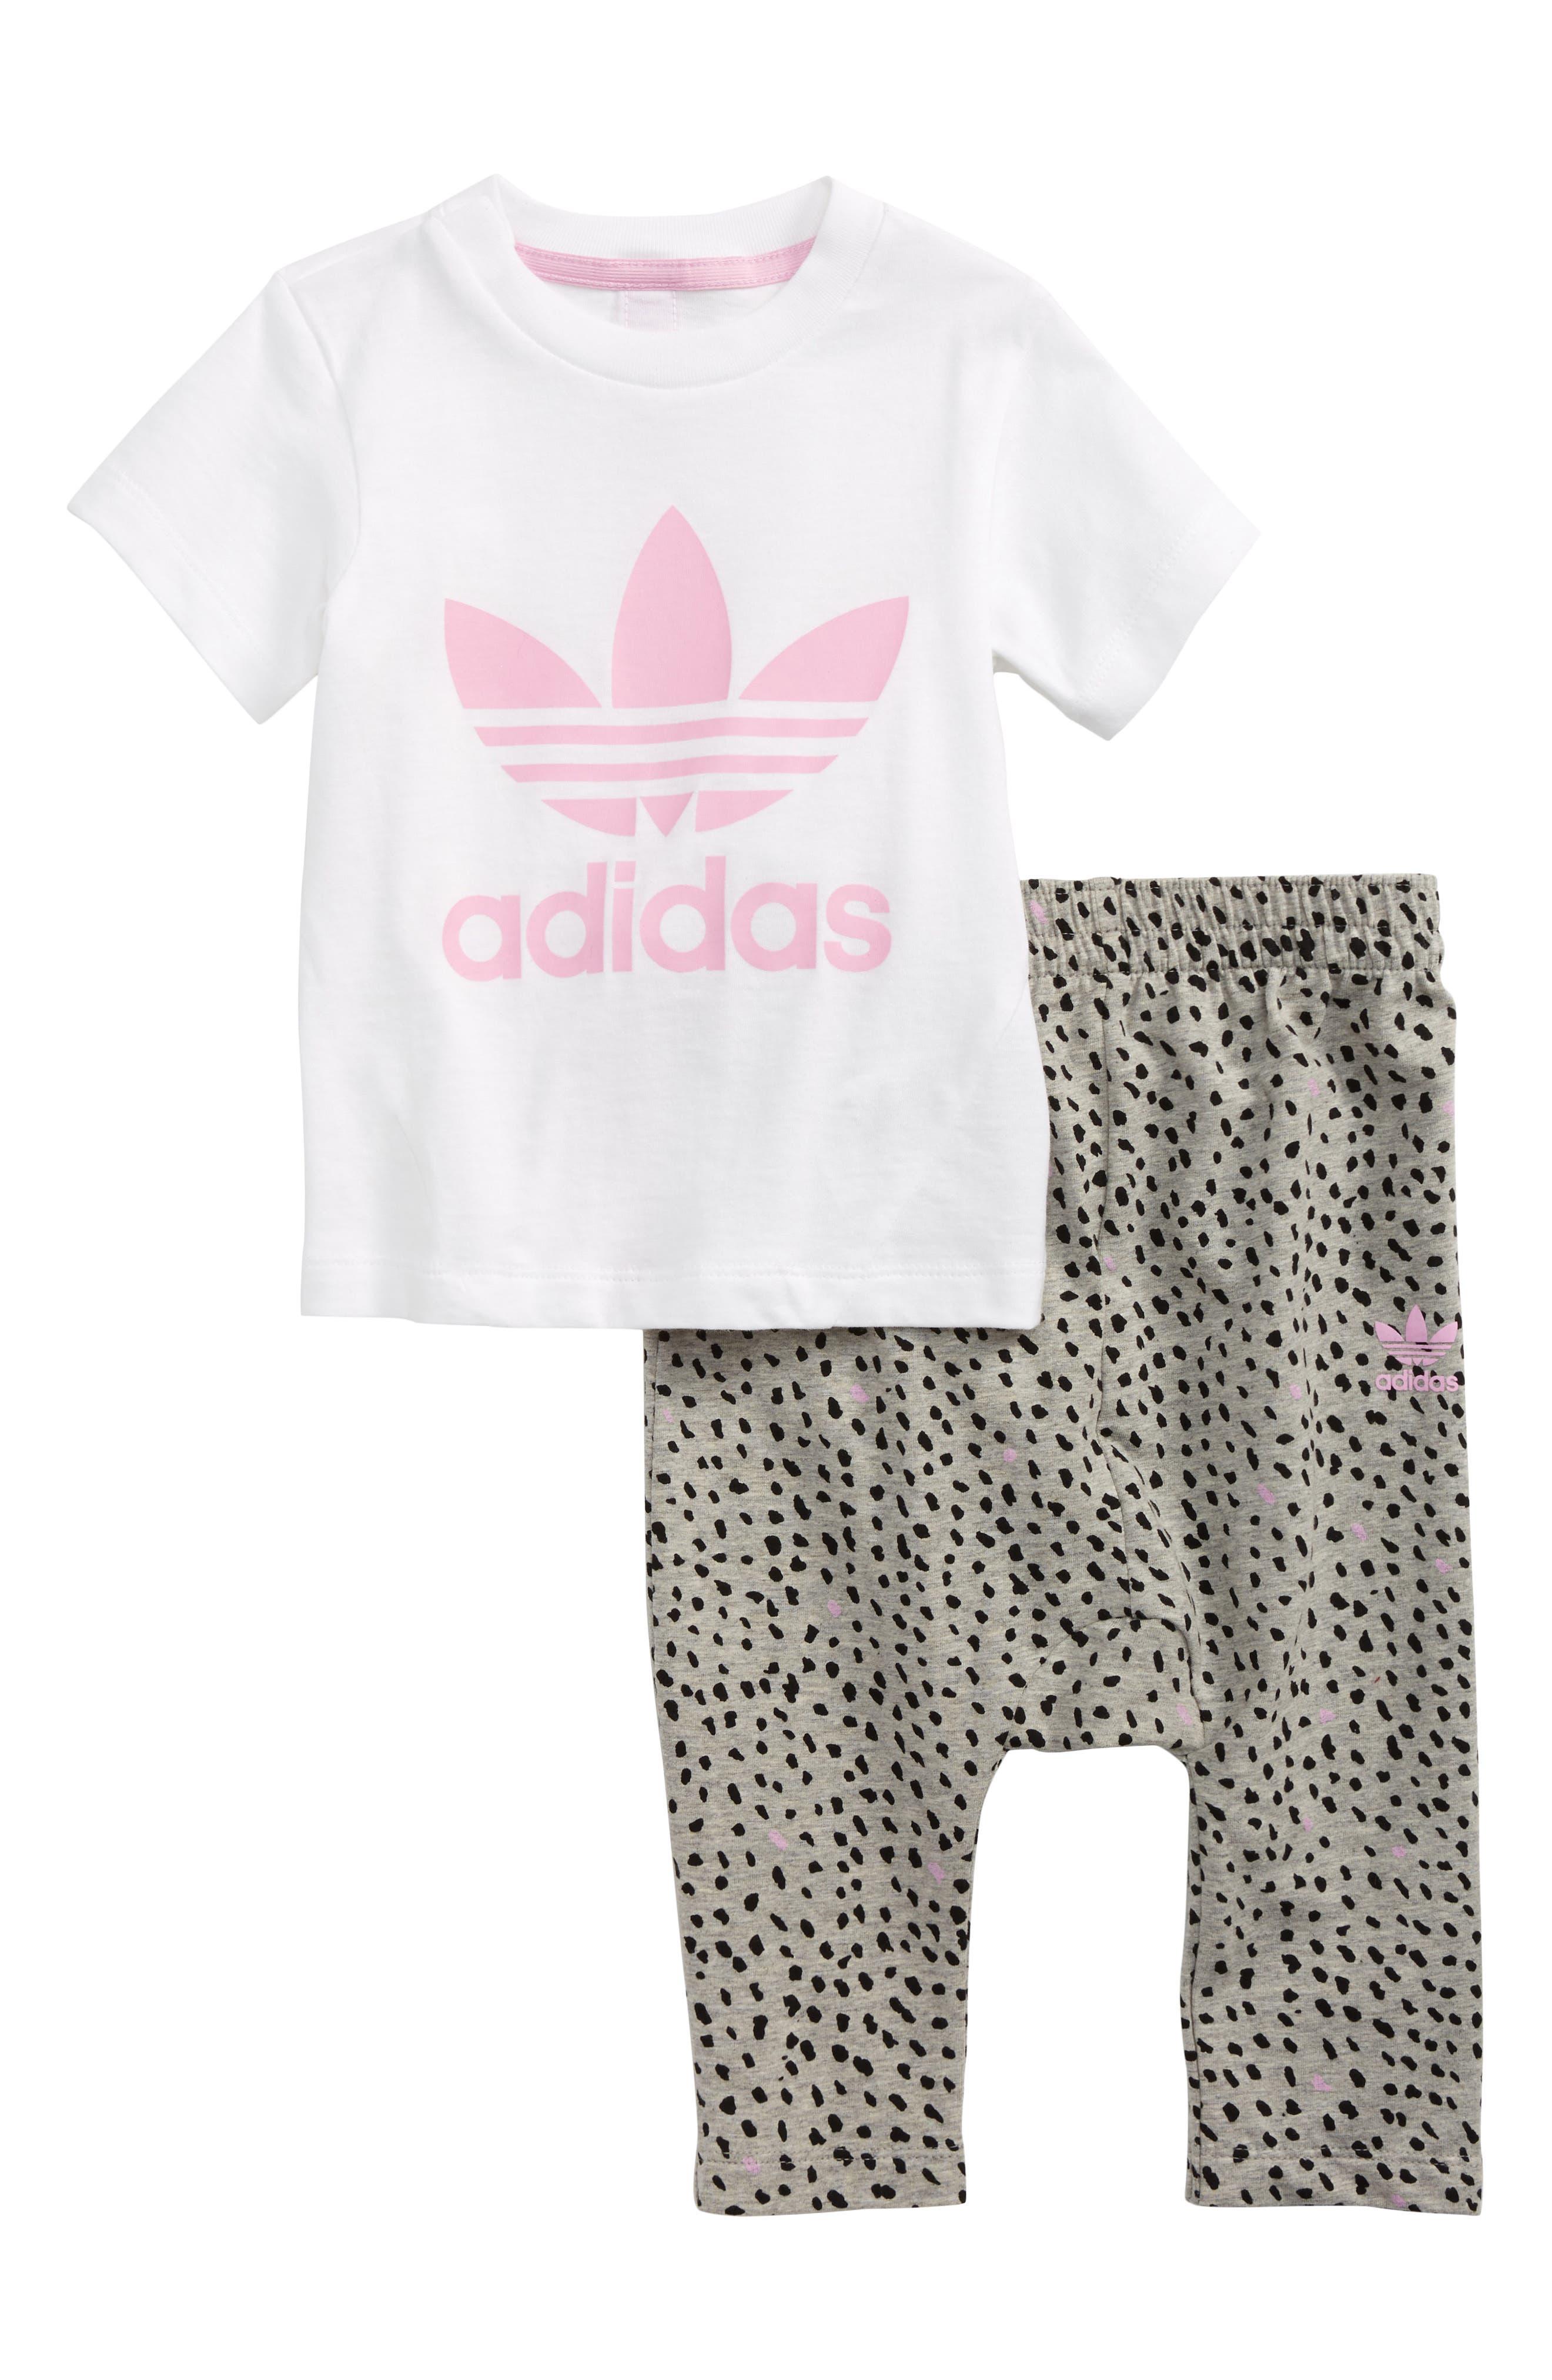 Alternate Image 1 Selected - adidas Originals Logo Tee & Print Leggings Set (Baby Girls)